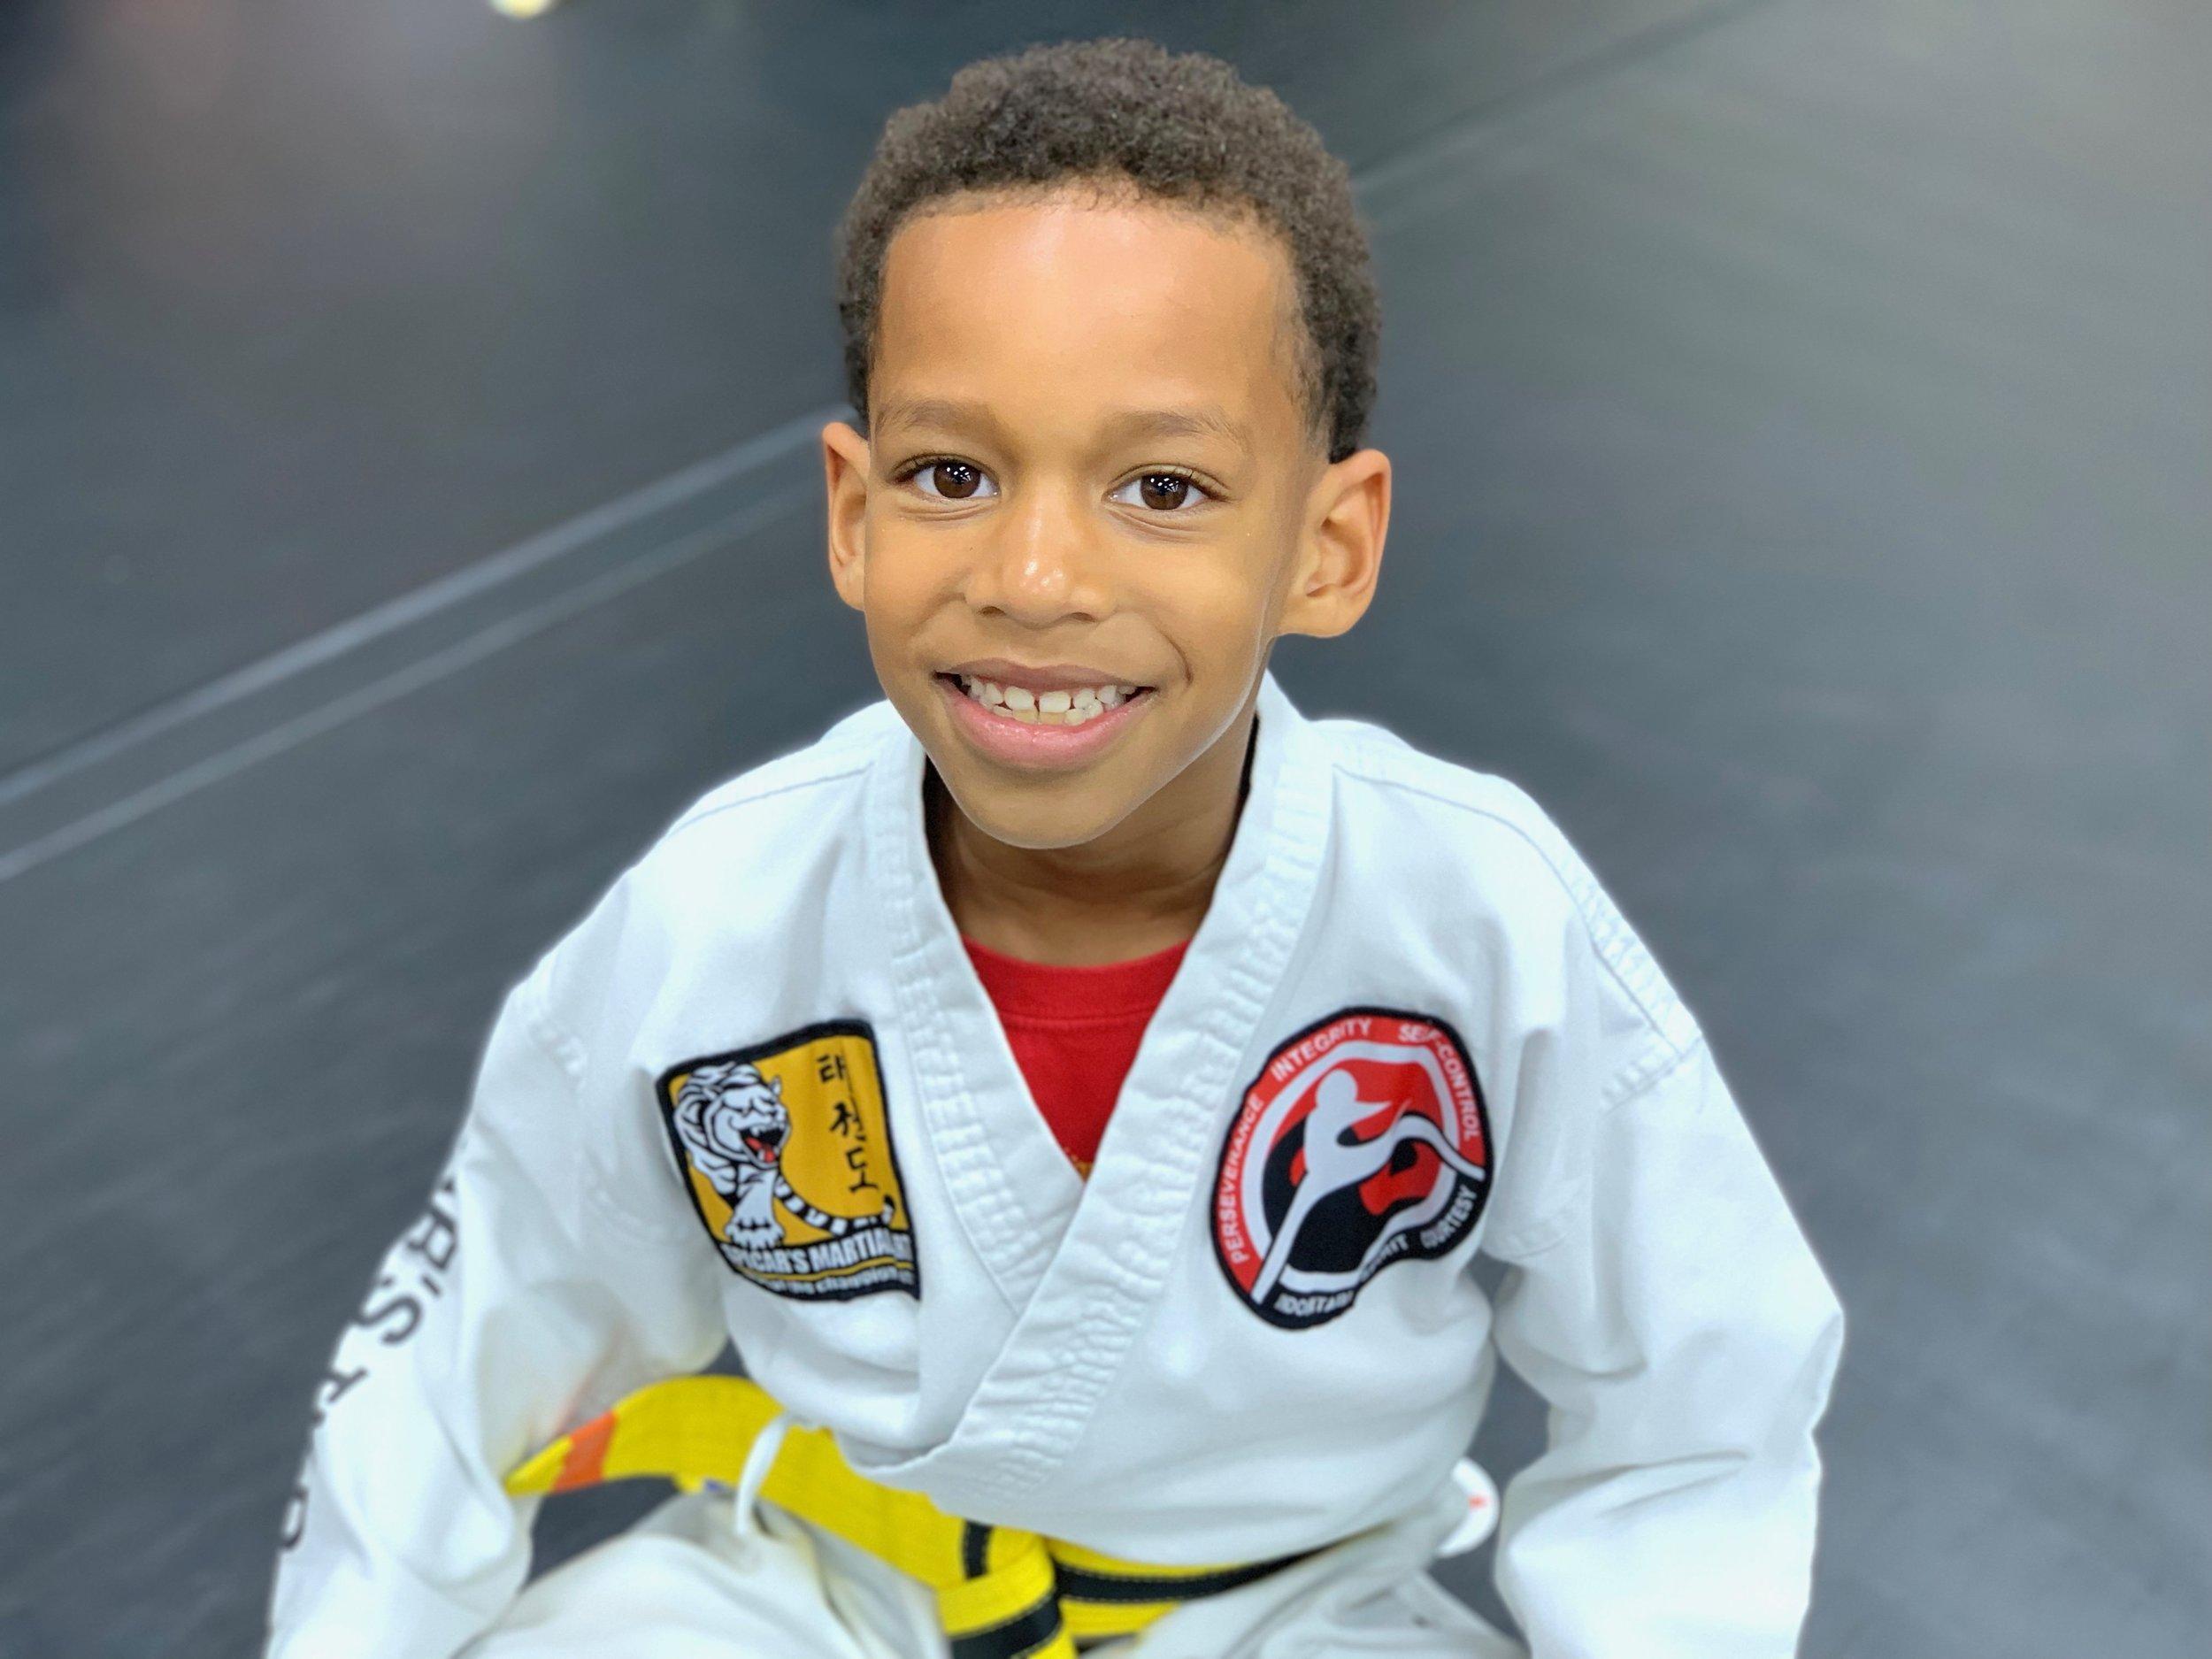 karate-kids-program-souhtlake-keller-grapevine-texas00006.jpeg